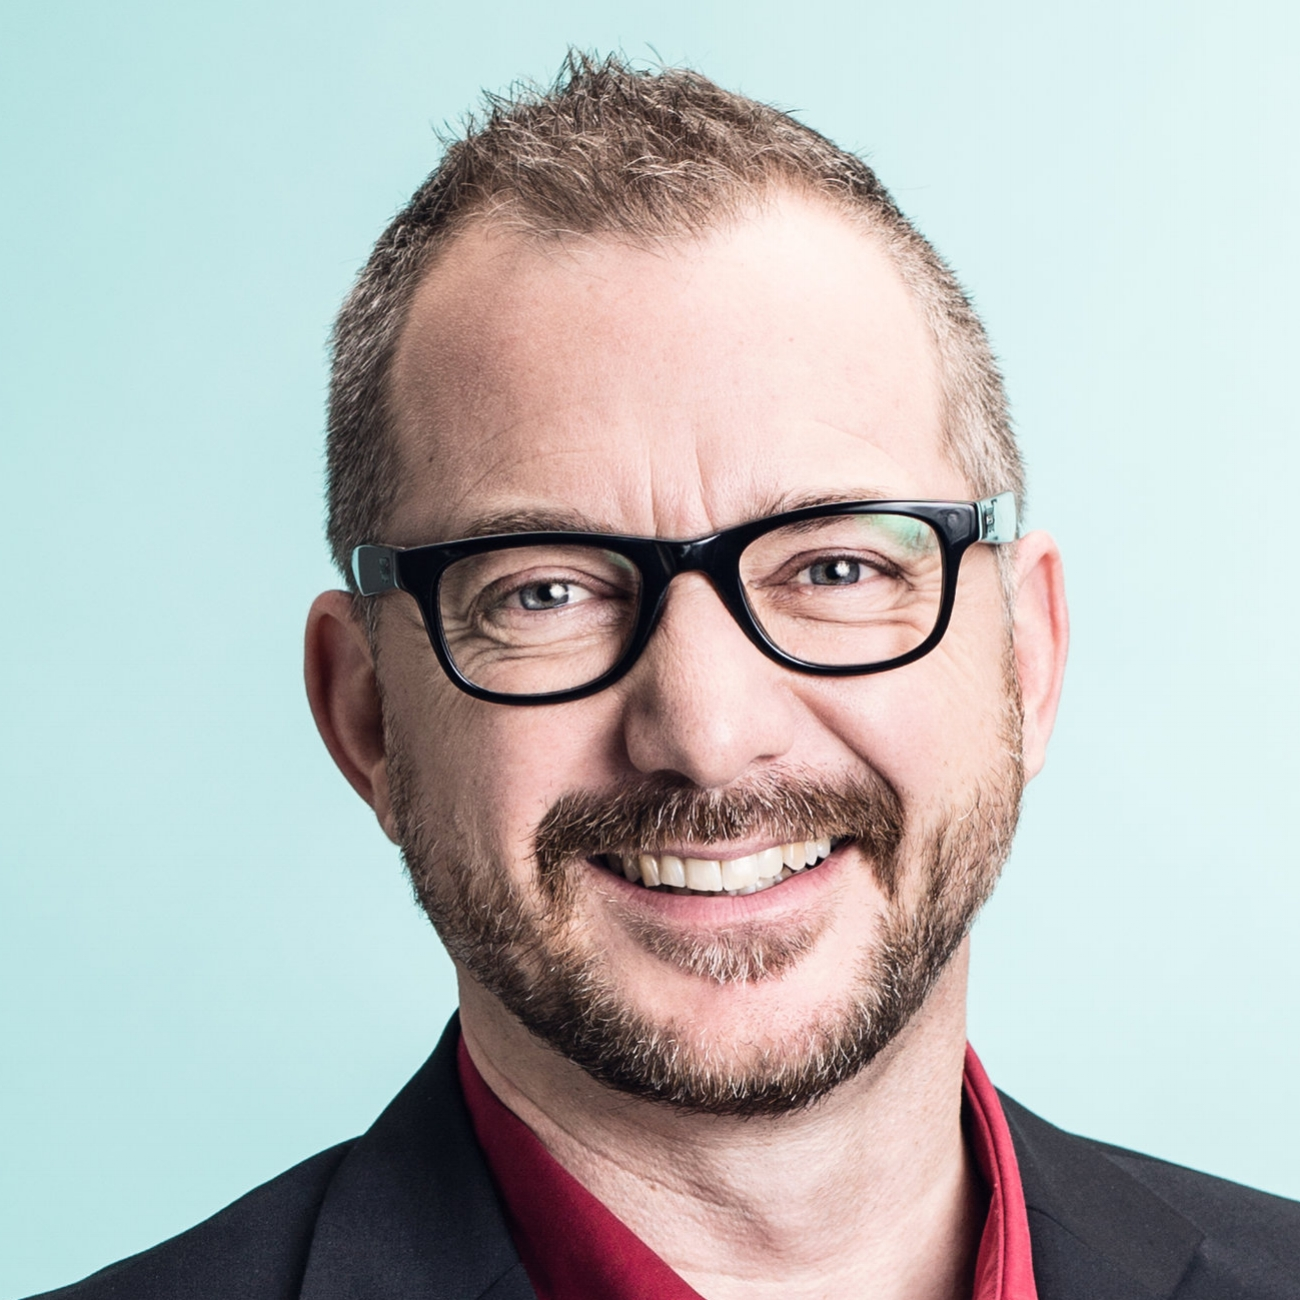 Patrick Rohr (Moderation)